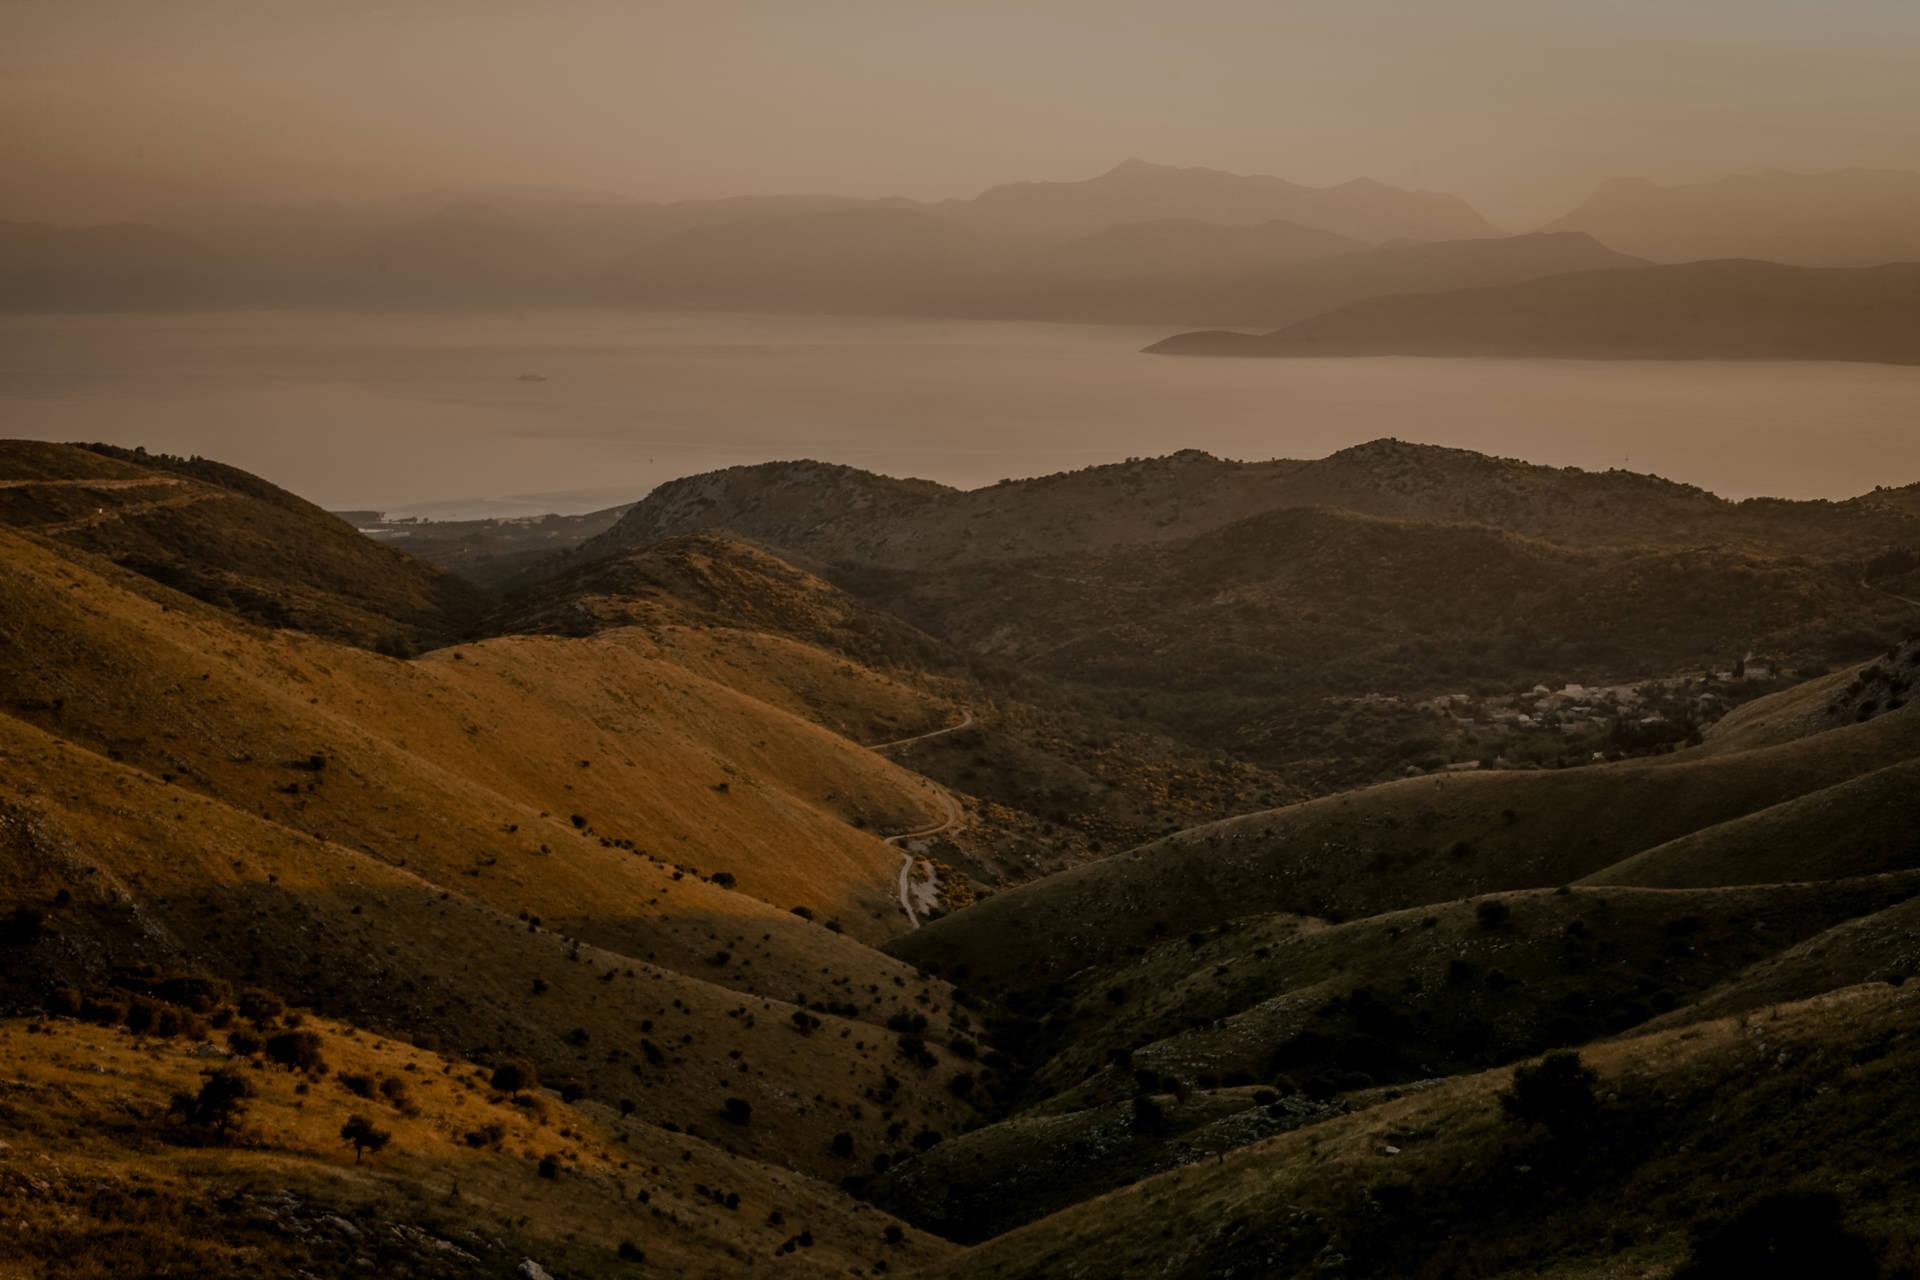 Najlepsze atrakcje na Korfu. Góra Pantokrator